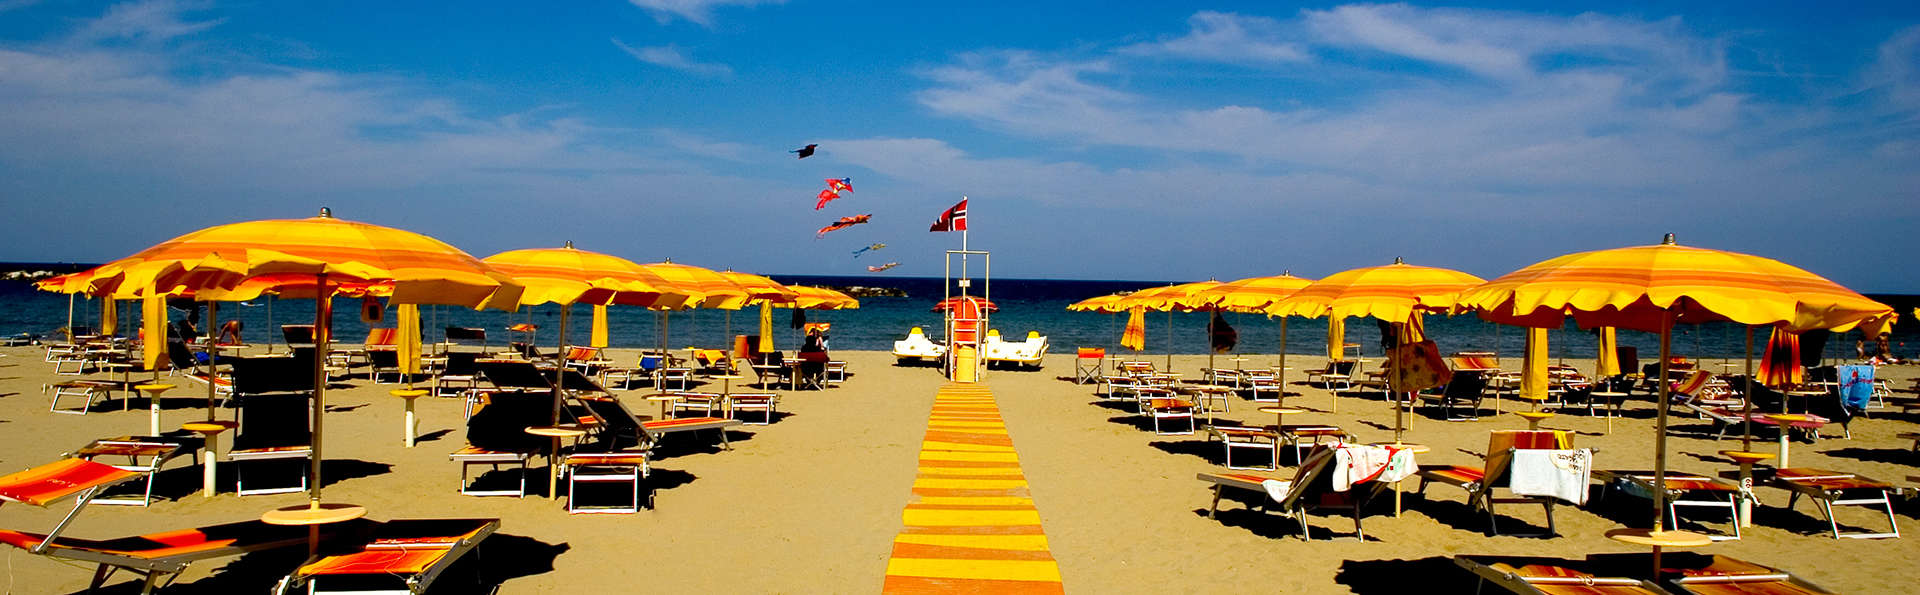 Hotel Giannella - EDIT_rimini6.jpg